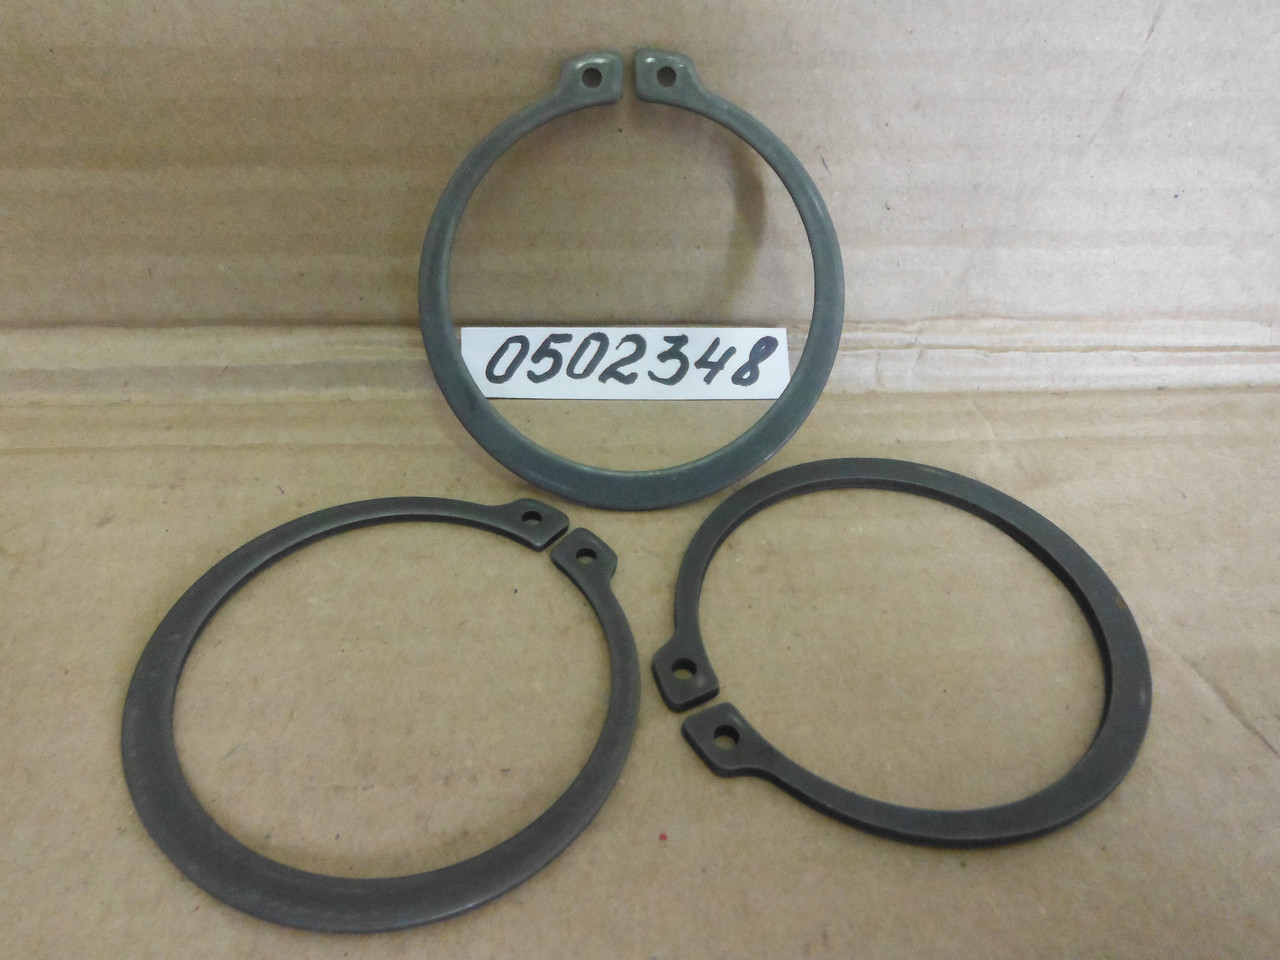 STILL 0502348 стопорное кольцо / стопорне кільце